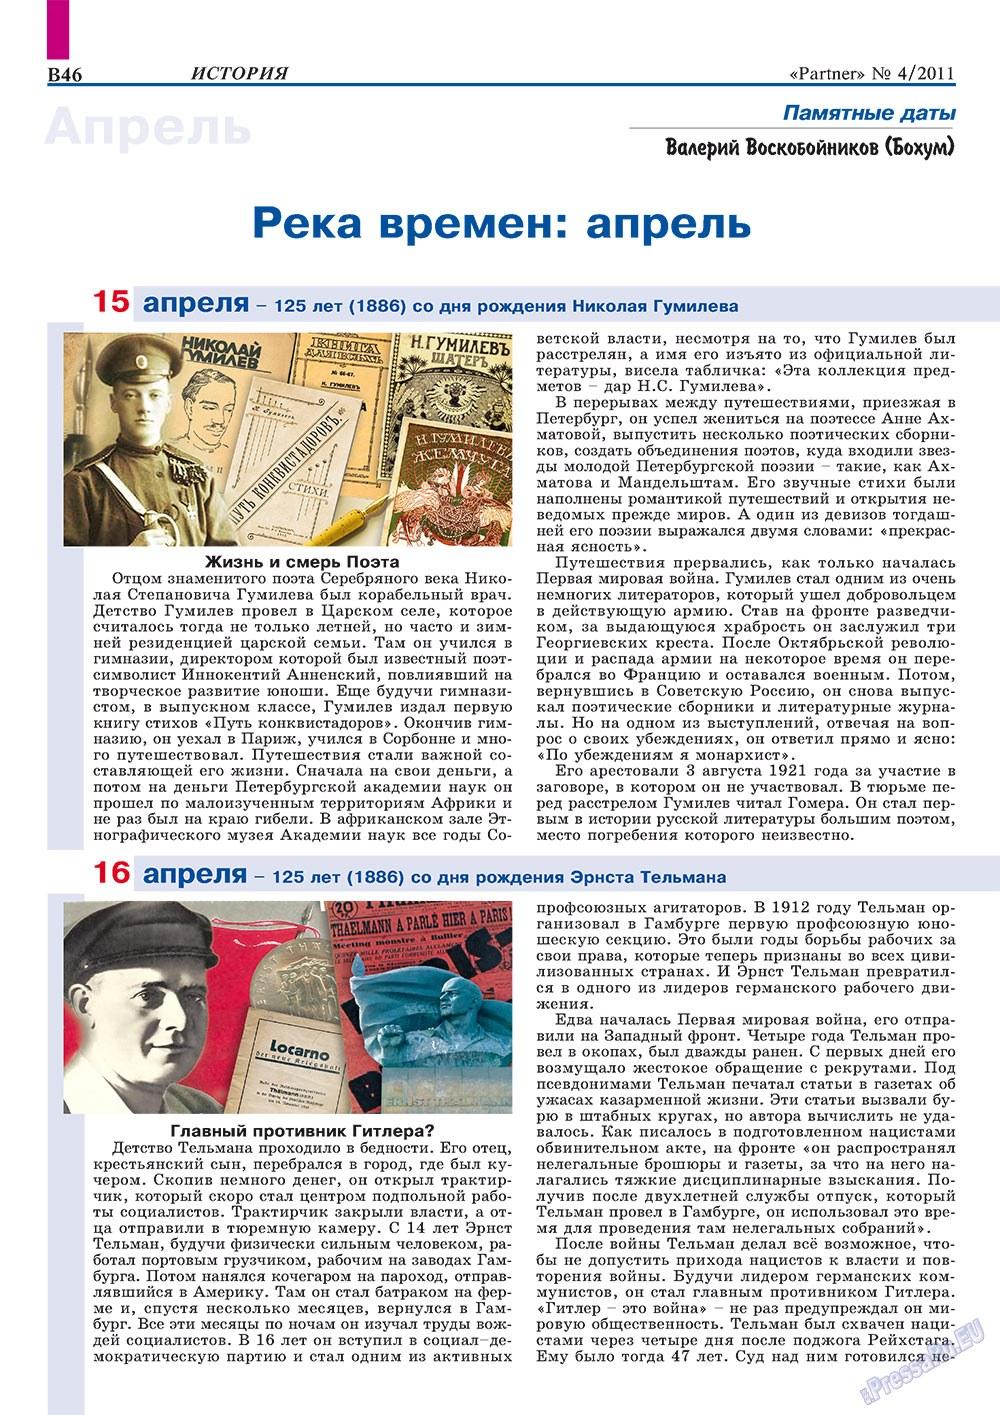 Партнер-север (журнал). 2011 год, номер 4, стр. 56